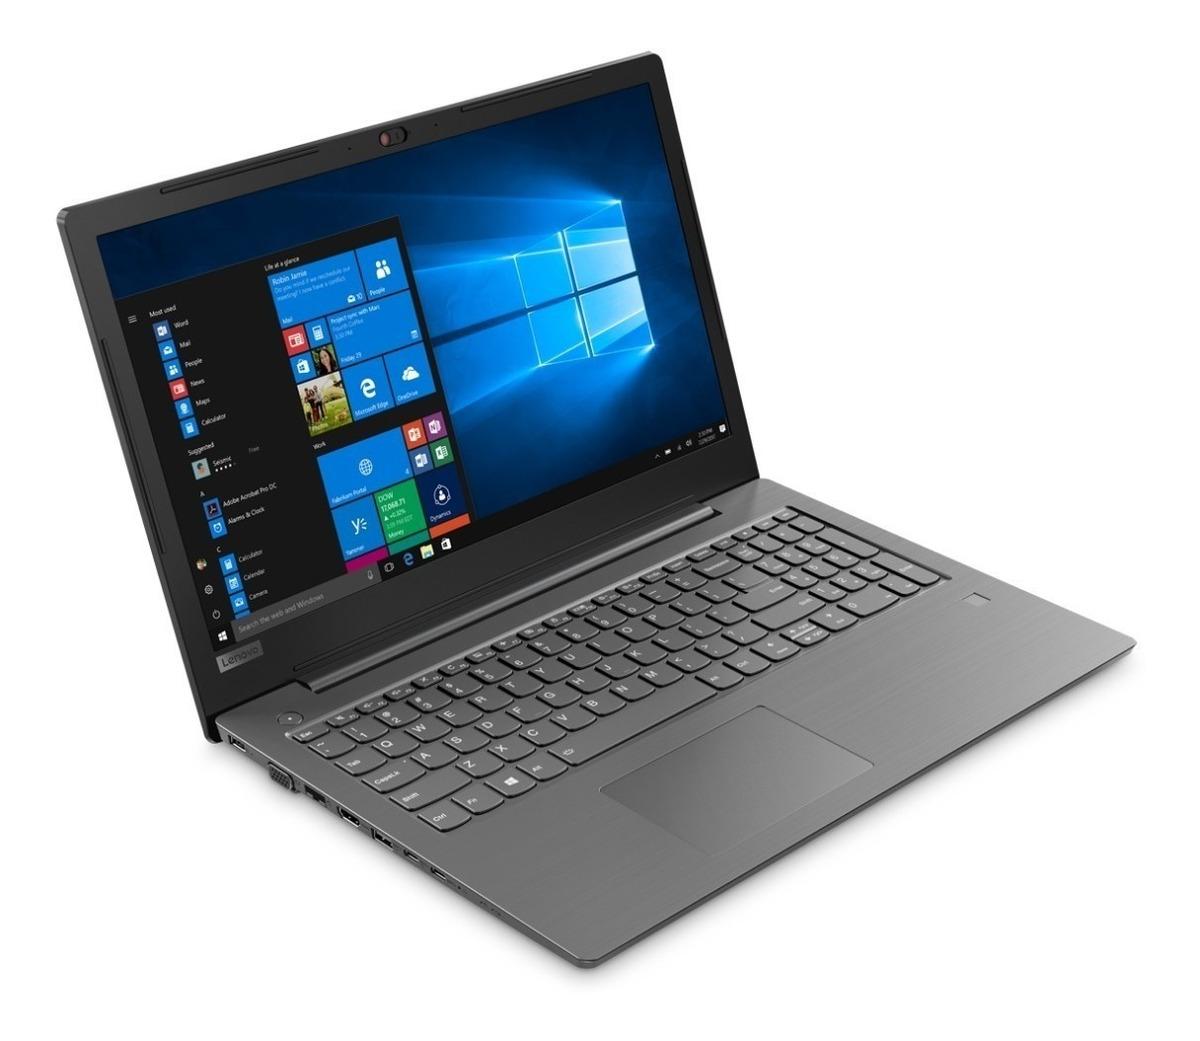 Notebook Lenovo V330 Core I5 8250u 12gb 1tb 15.6 Ssd 256  M2